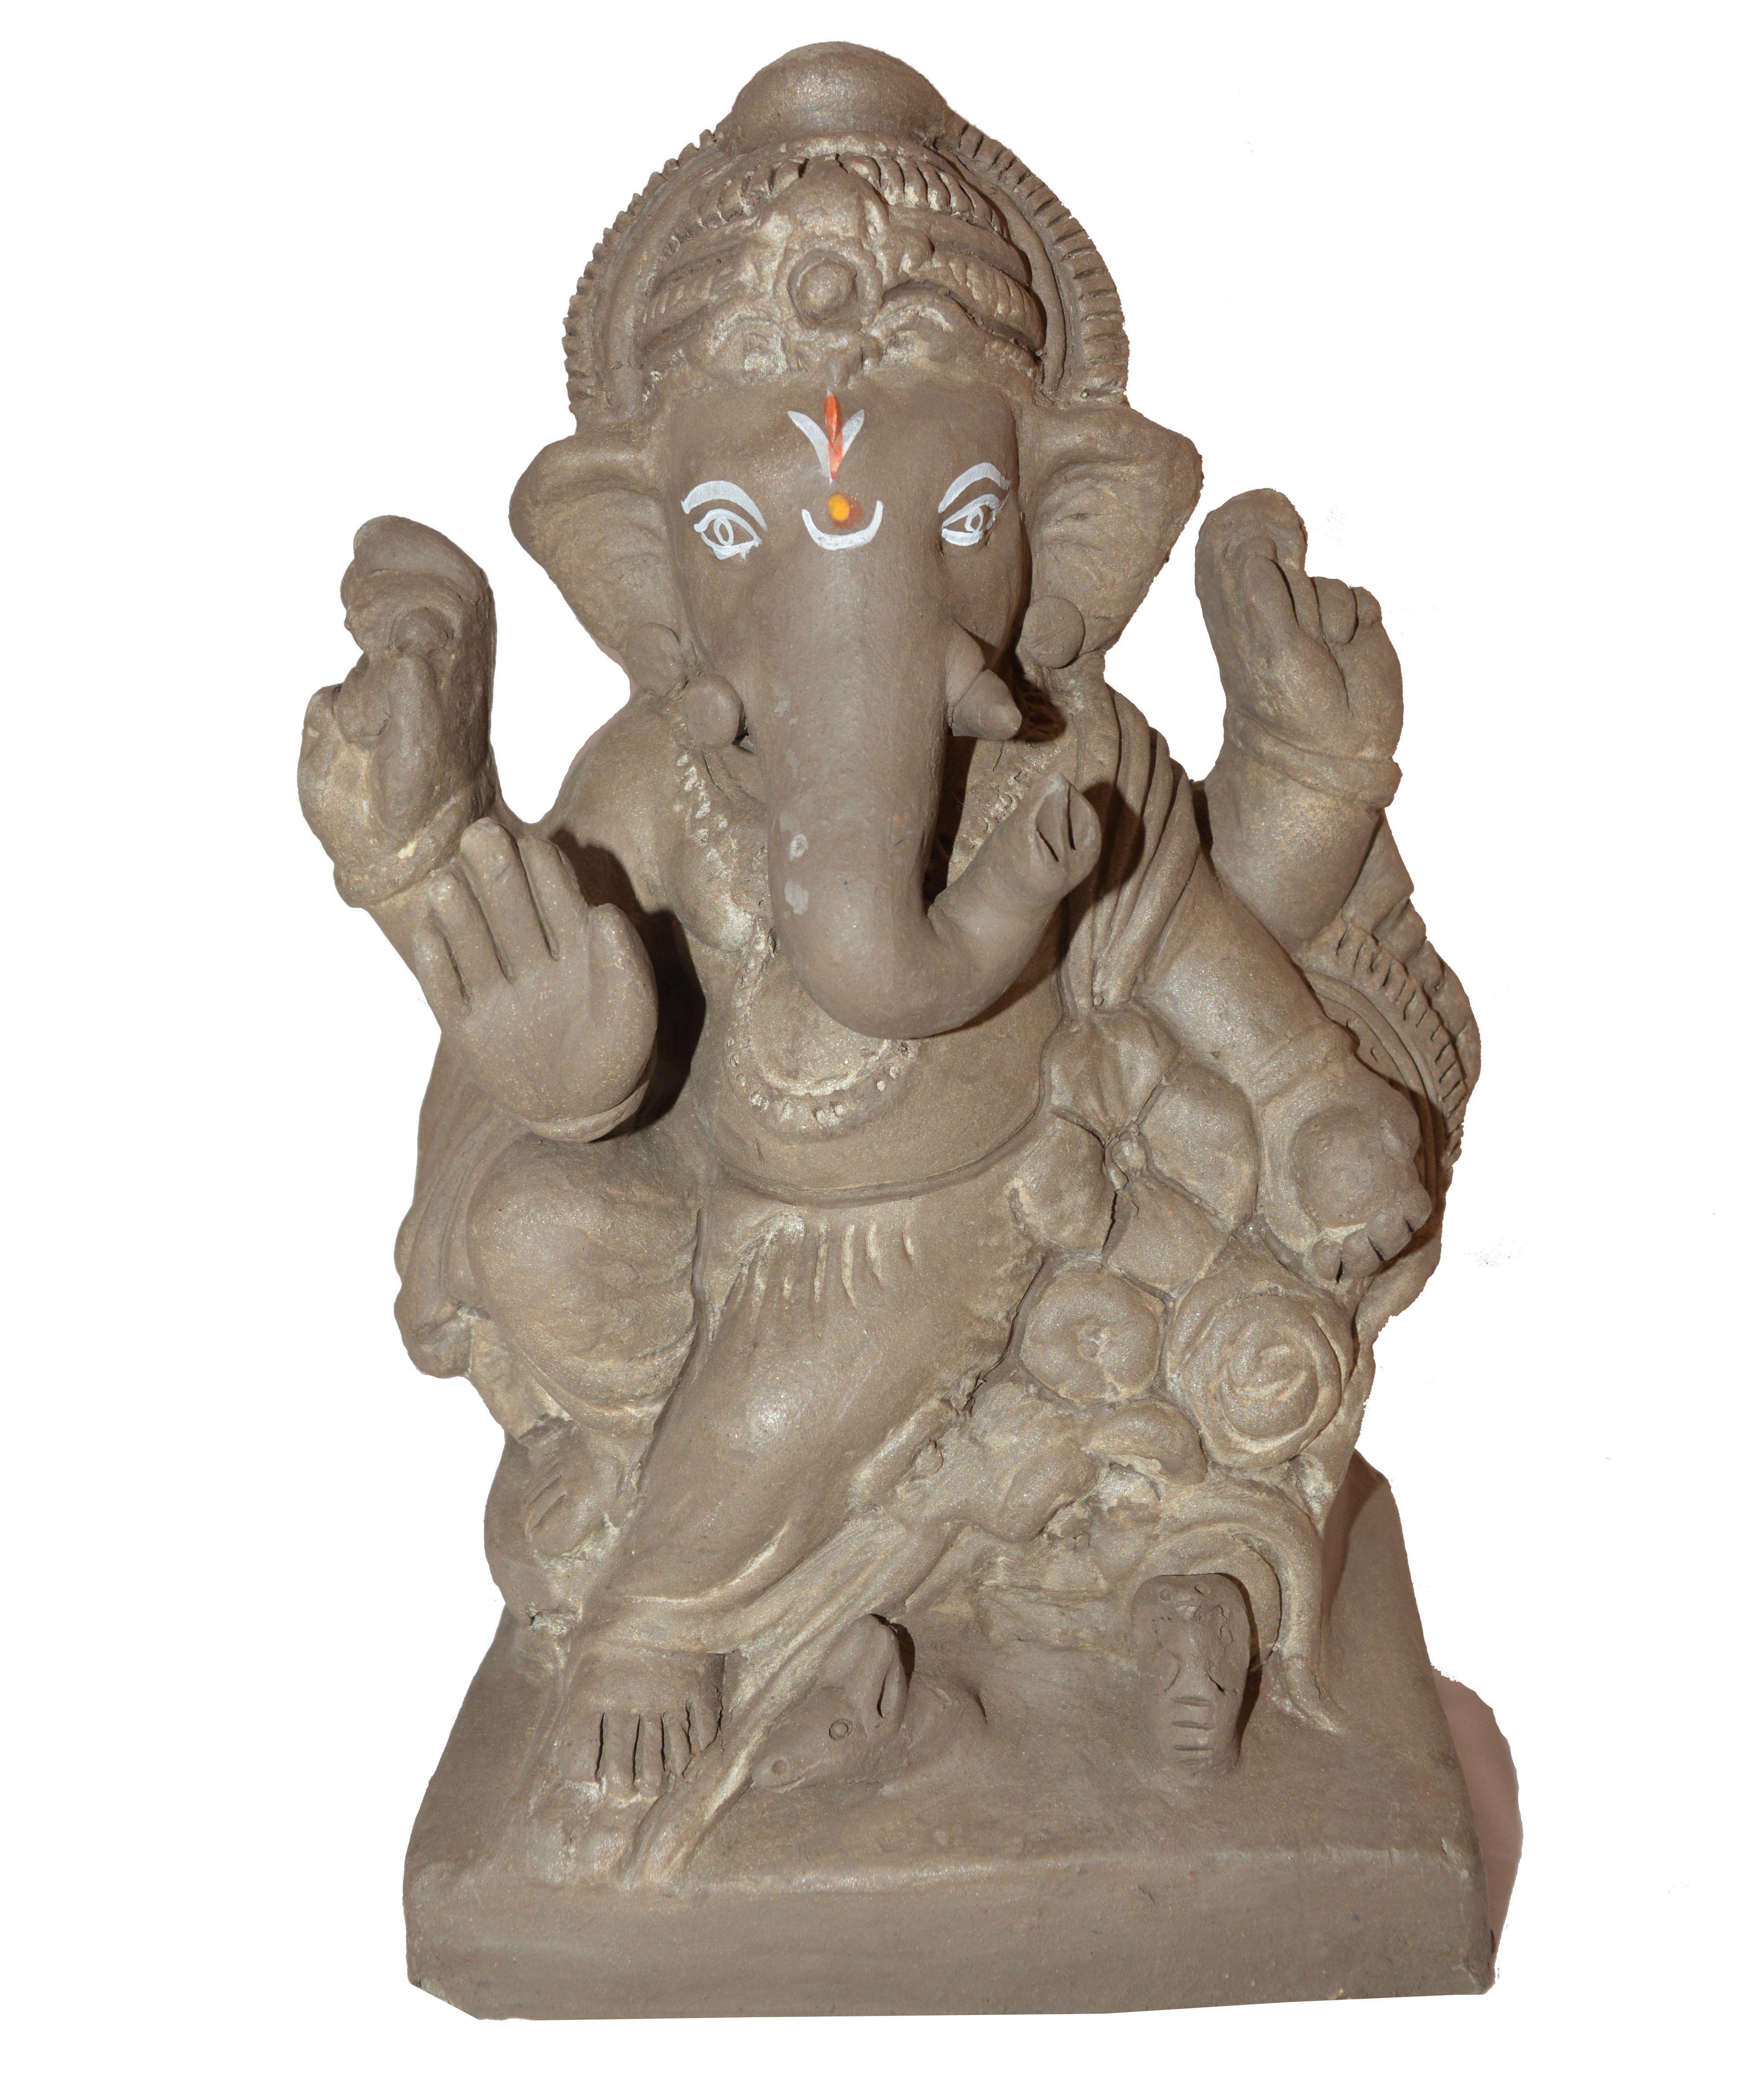 Ganesha Idols Made Of Clay And Natural Manure : Height   7 Inches - Ganesh Idol, Transparent background PNG HD thumbnail